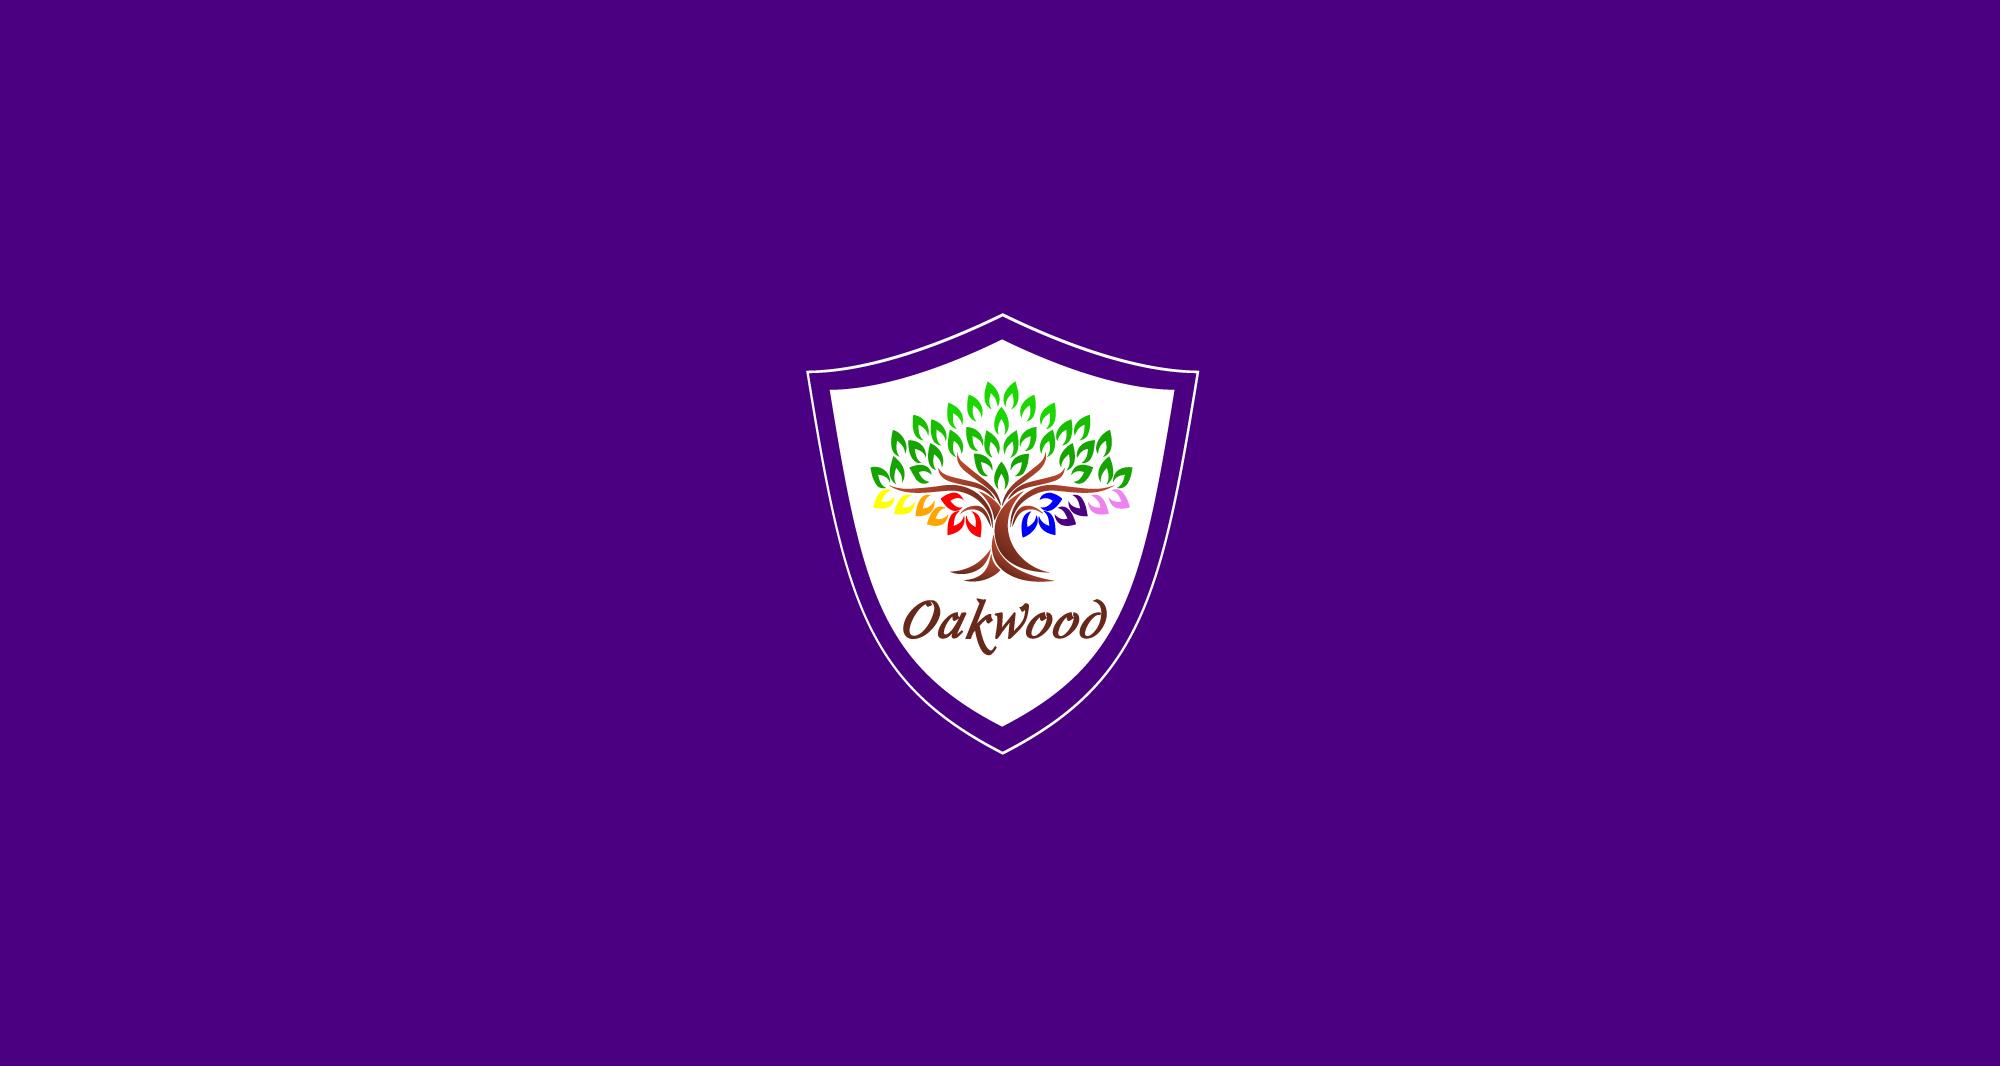 Oakwood Nursery brand